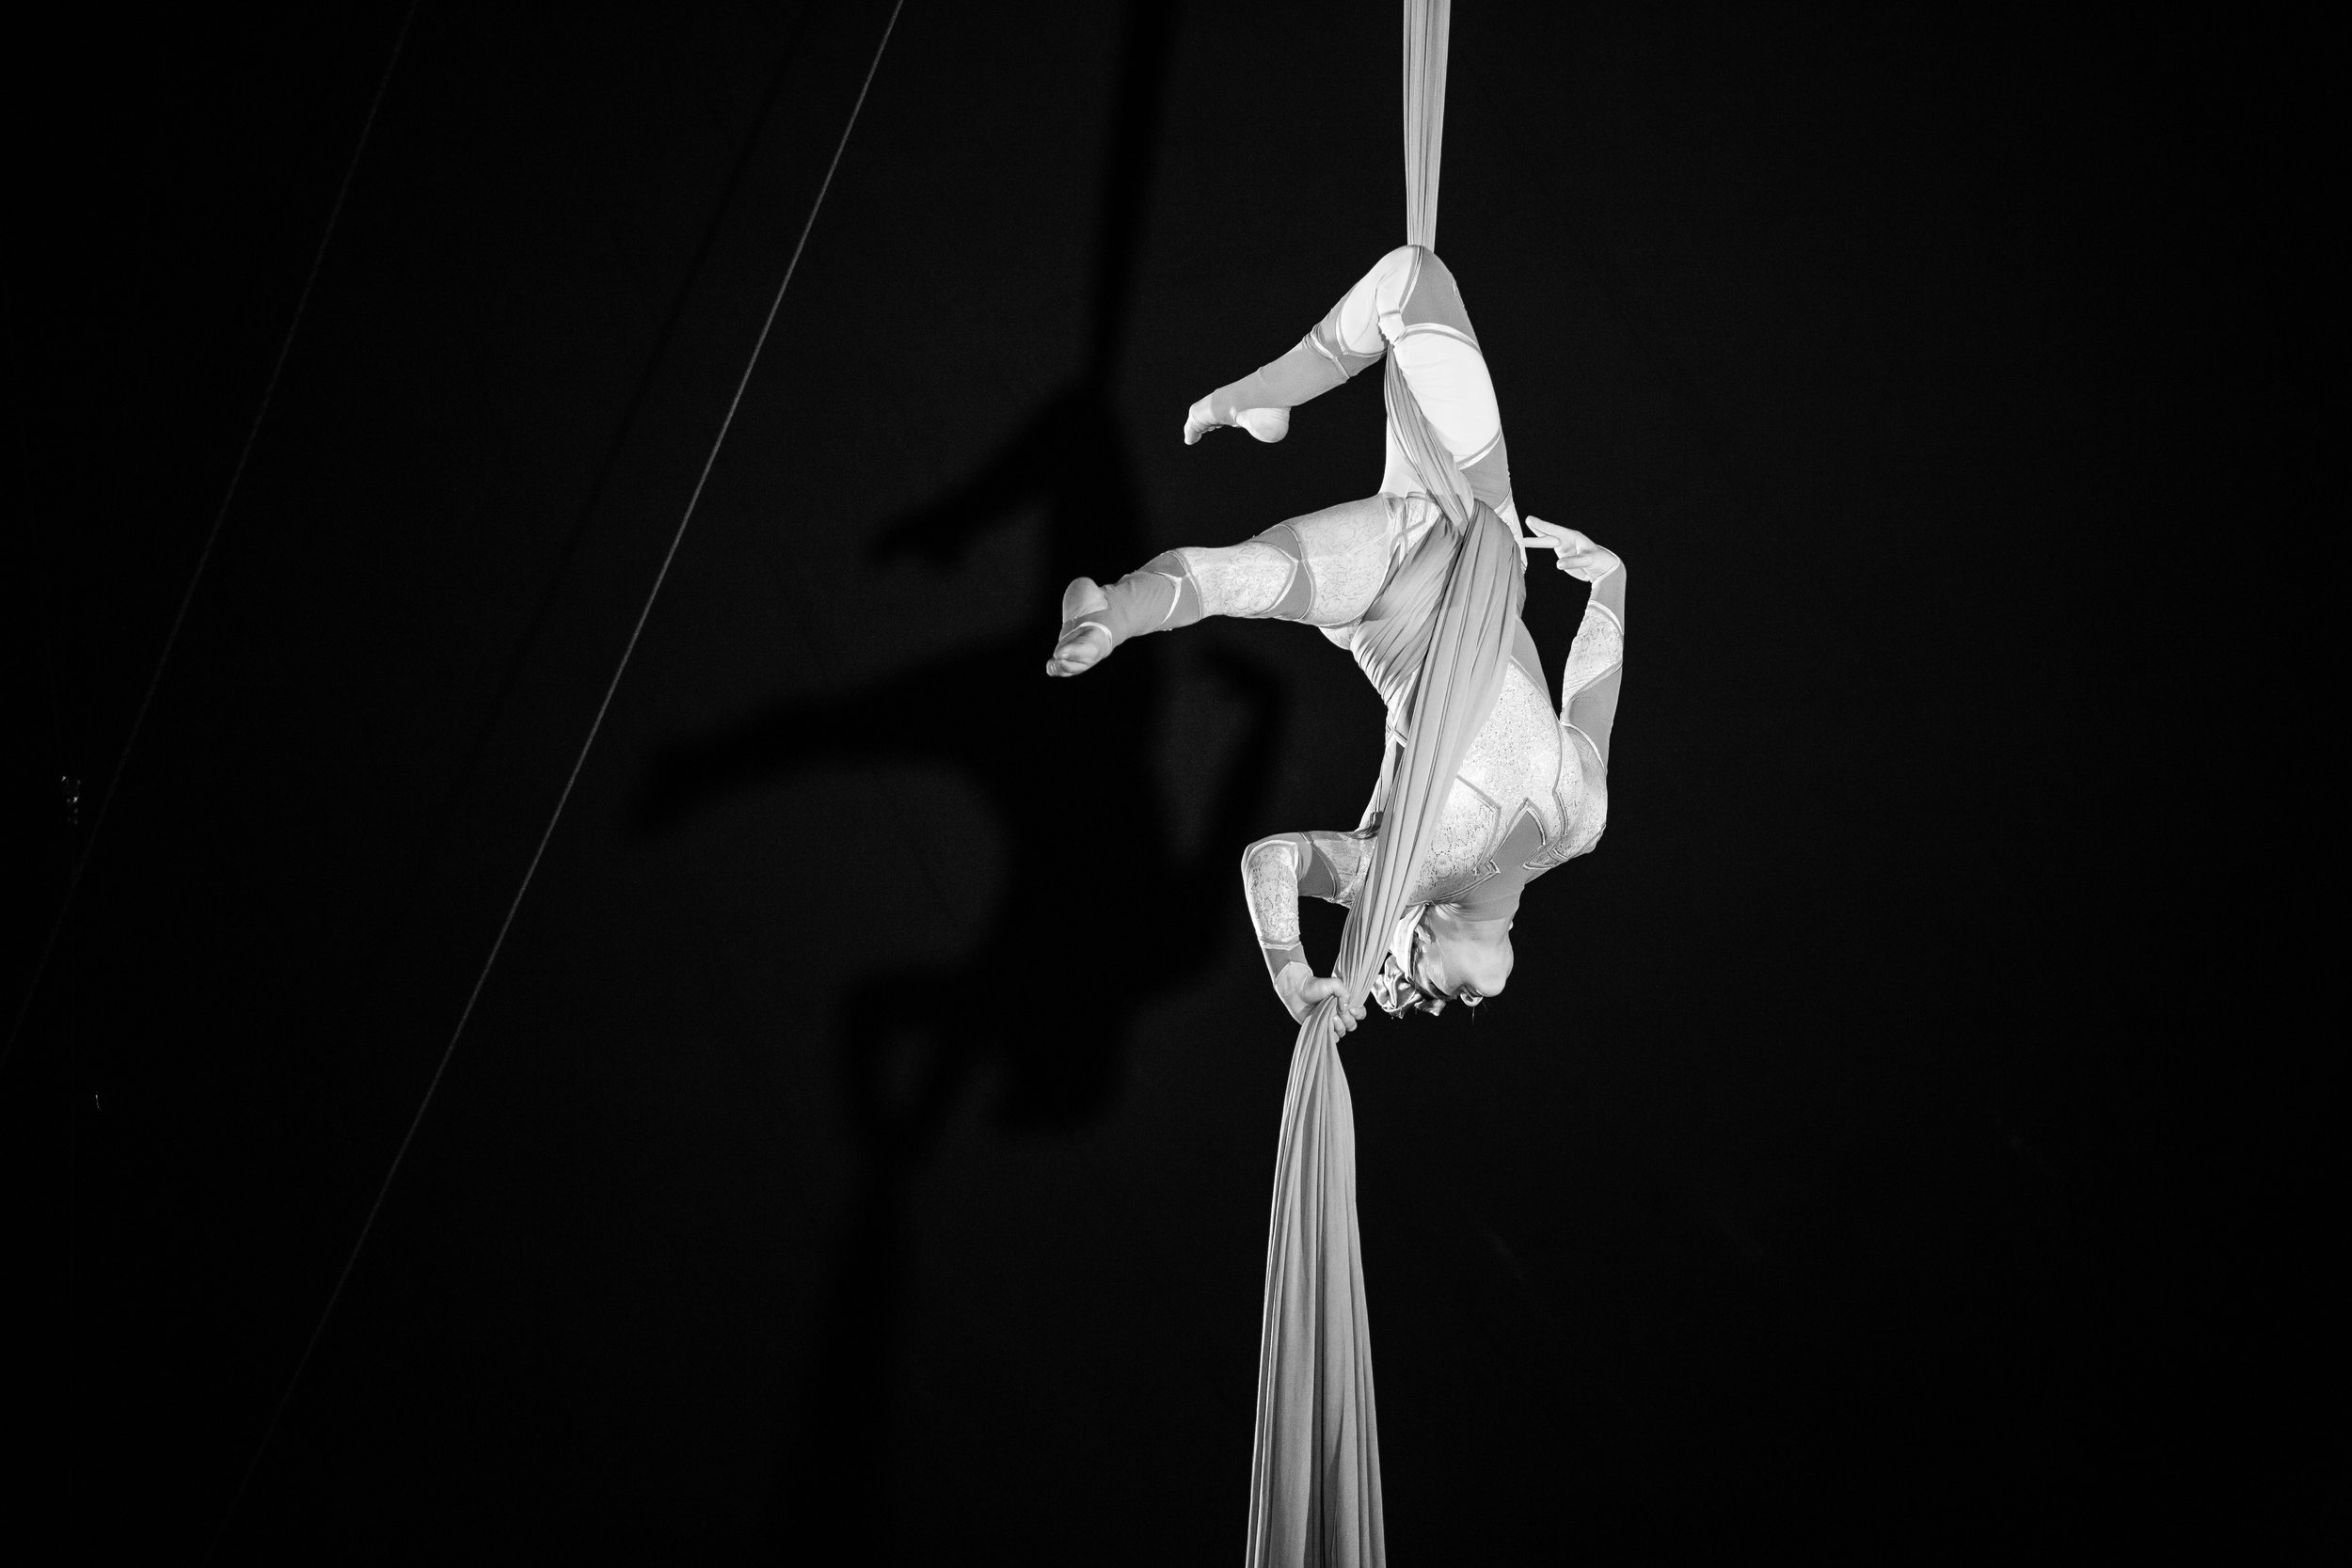 Lisandra Austin on silks by Gem Hall